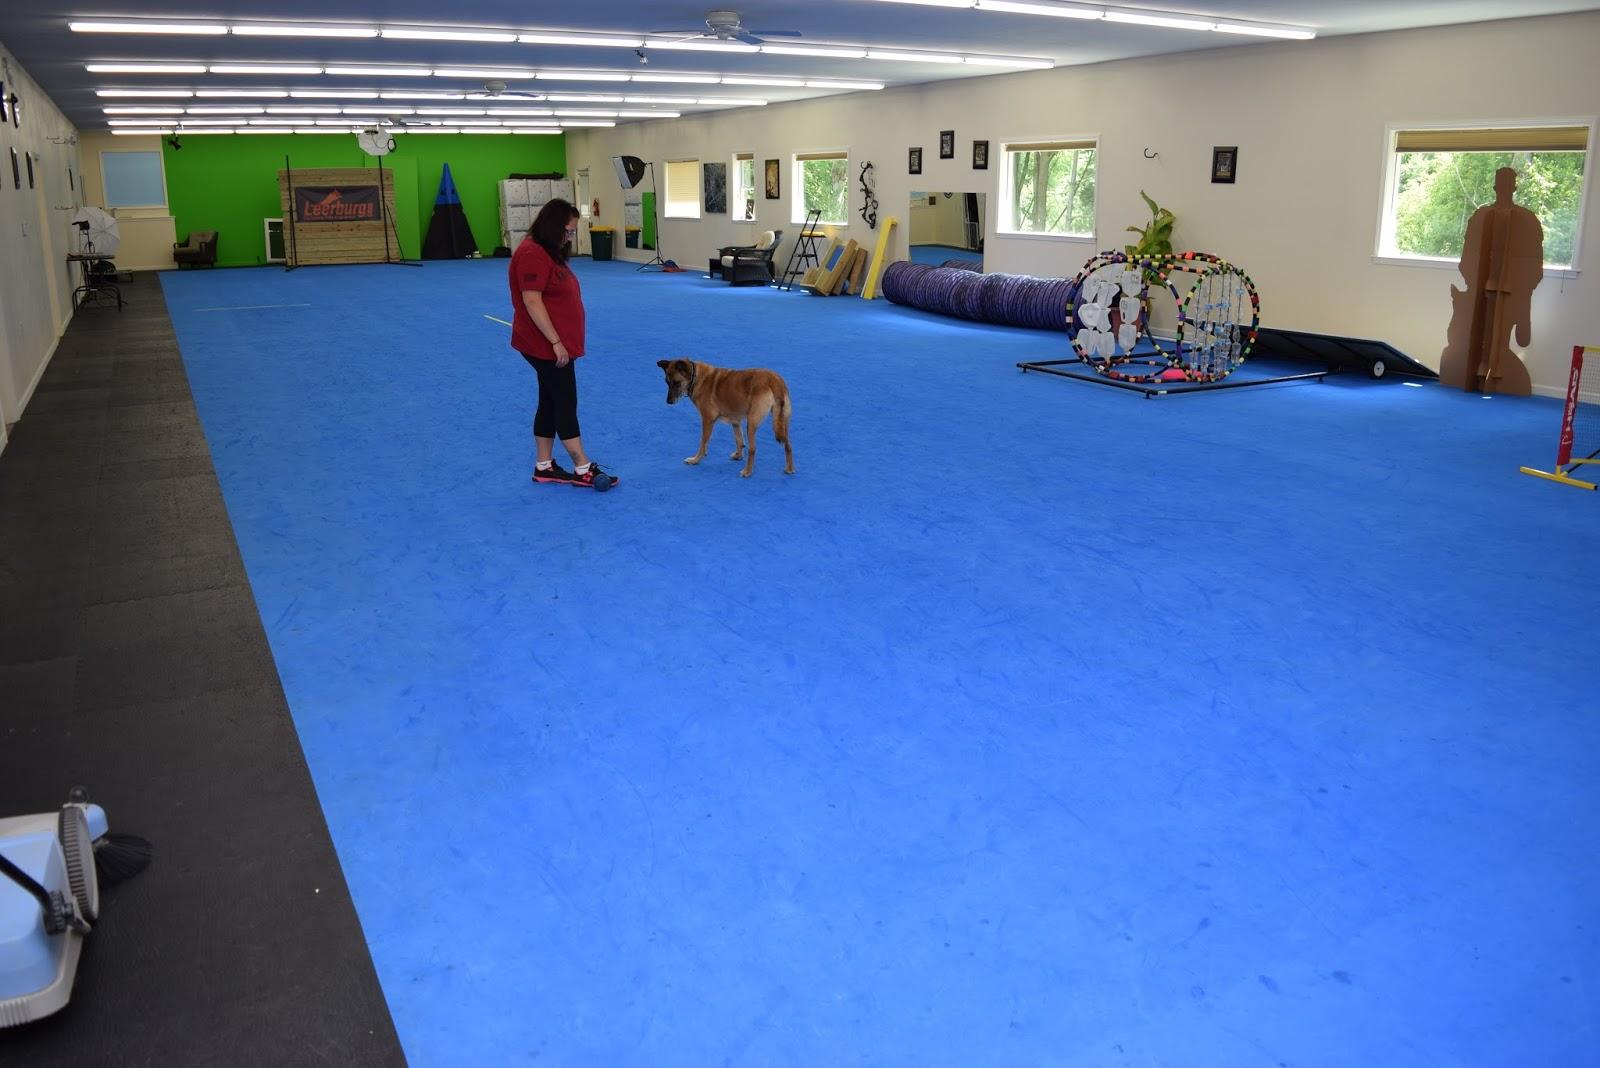 dog decoration sensational flooring photograph design floor ideas depot floors mat elegant home